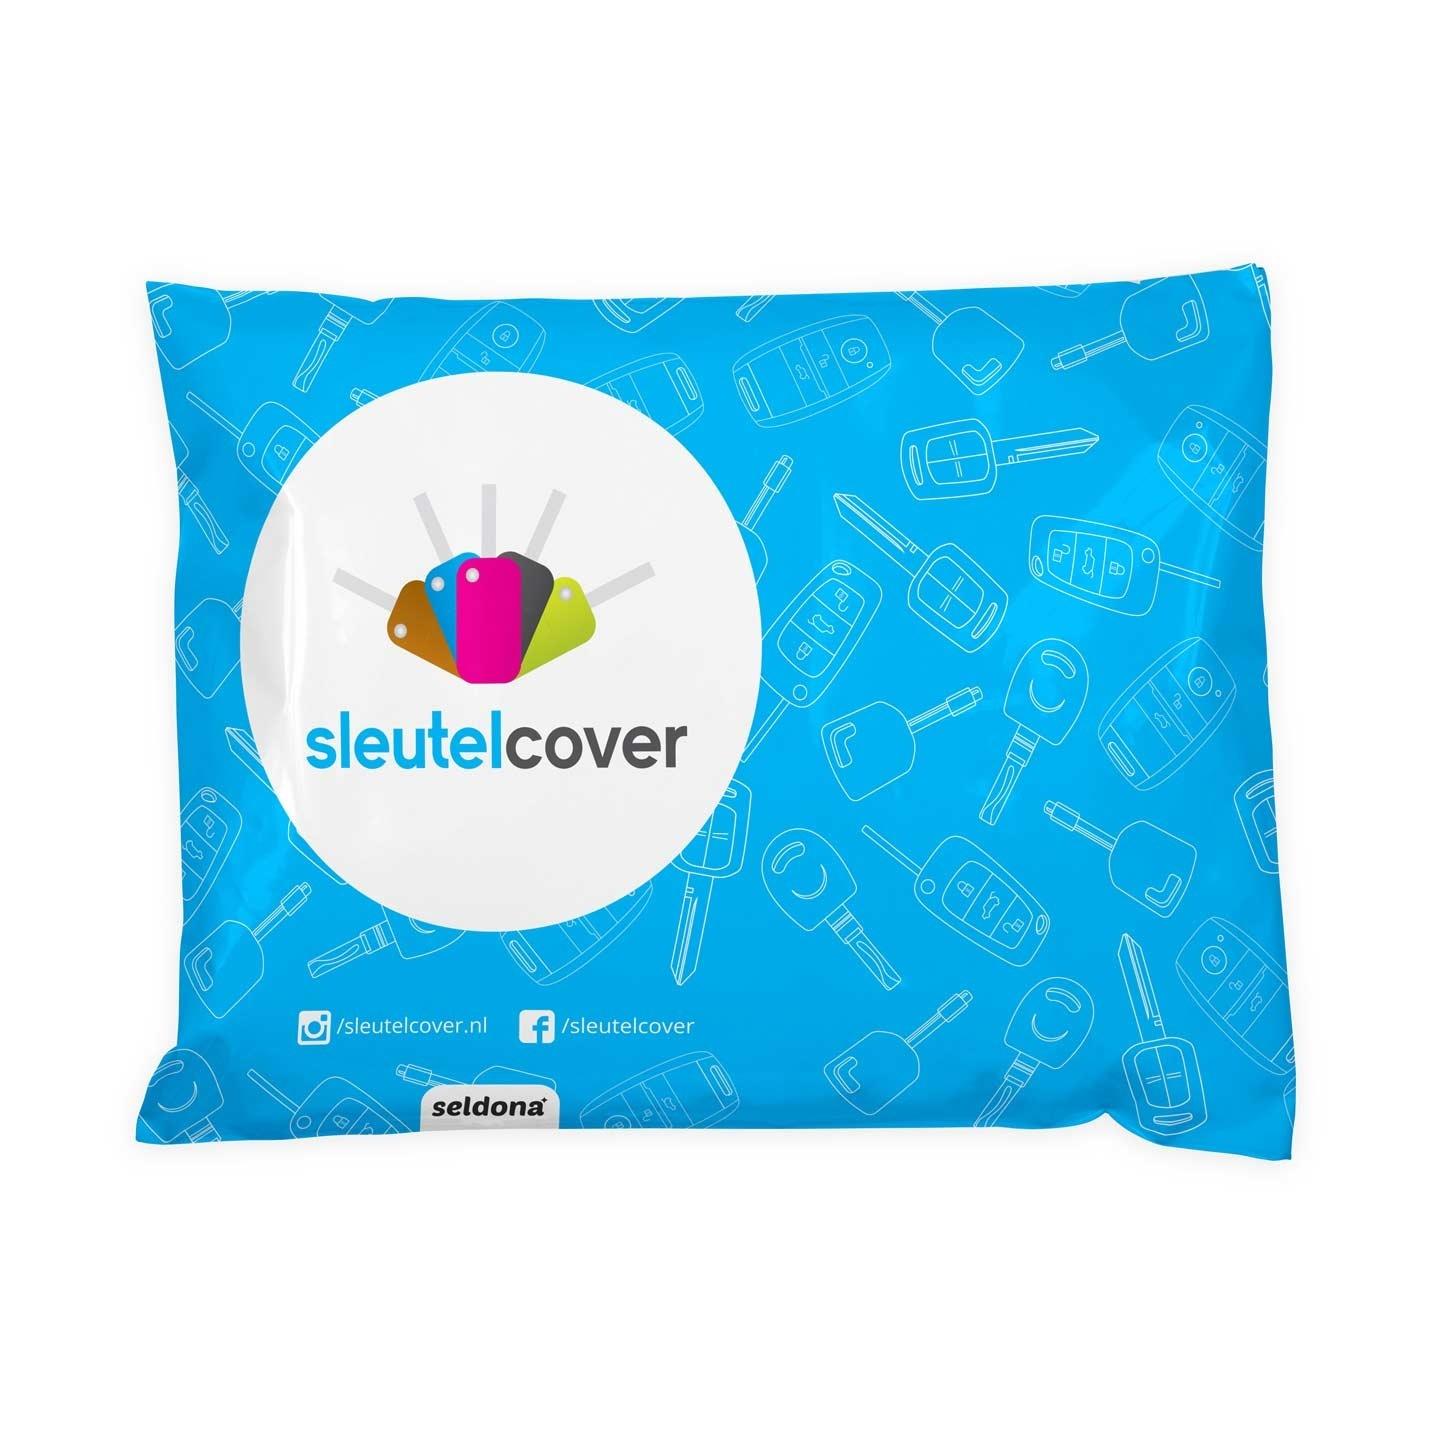 Mini SleutelCover - Roze / Silicone sleutelhoesje / beschermhoesje autosleutel